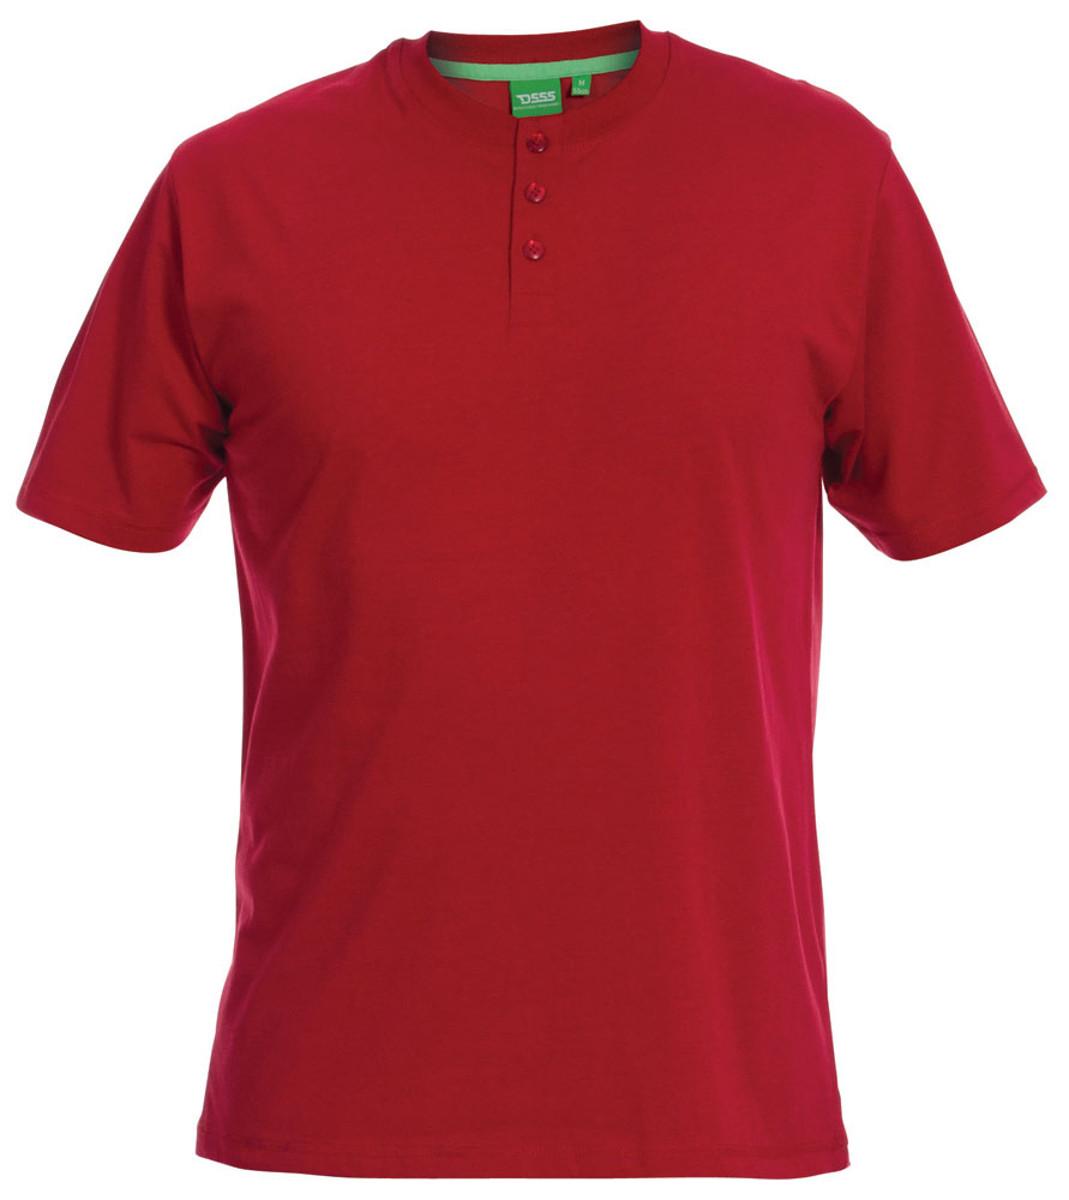 Mens big size pyjamas t shirt shorts cotton jersey red for Mens t shirts 4xl